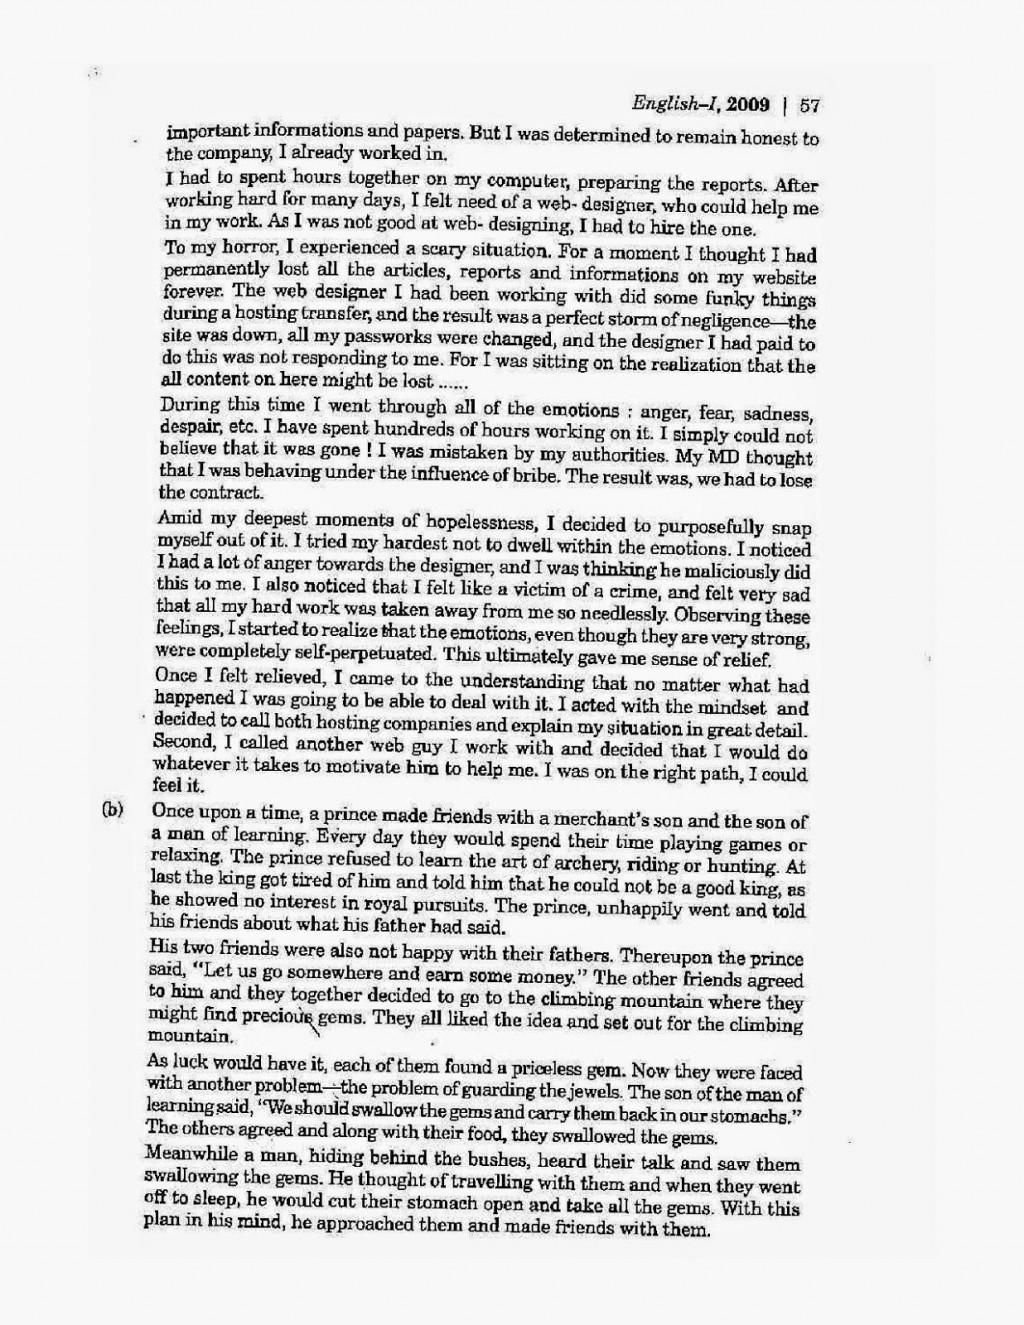 007 Grade English Essays Icse2benglish2bclass2b102b2009 Page Wonderful 12 Essay Examples Narrative Provincial Exam Sample Manitoba Large